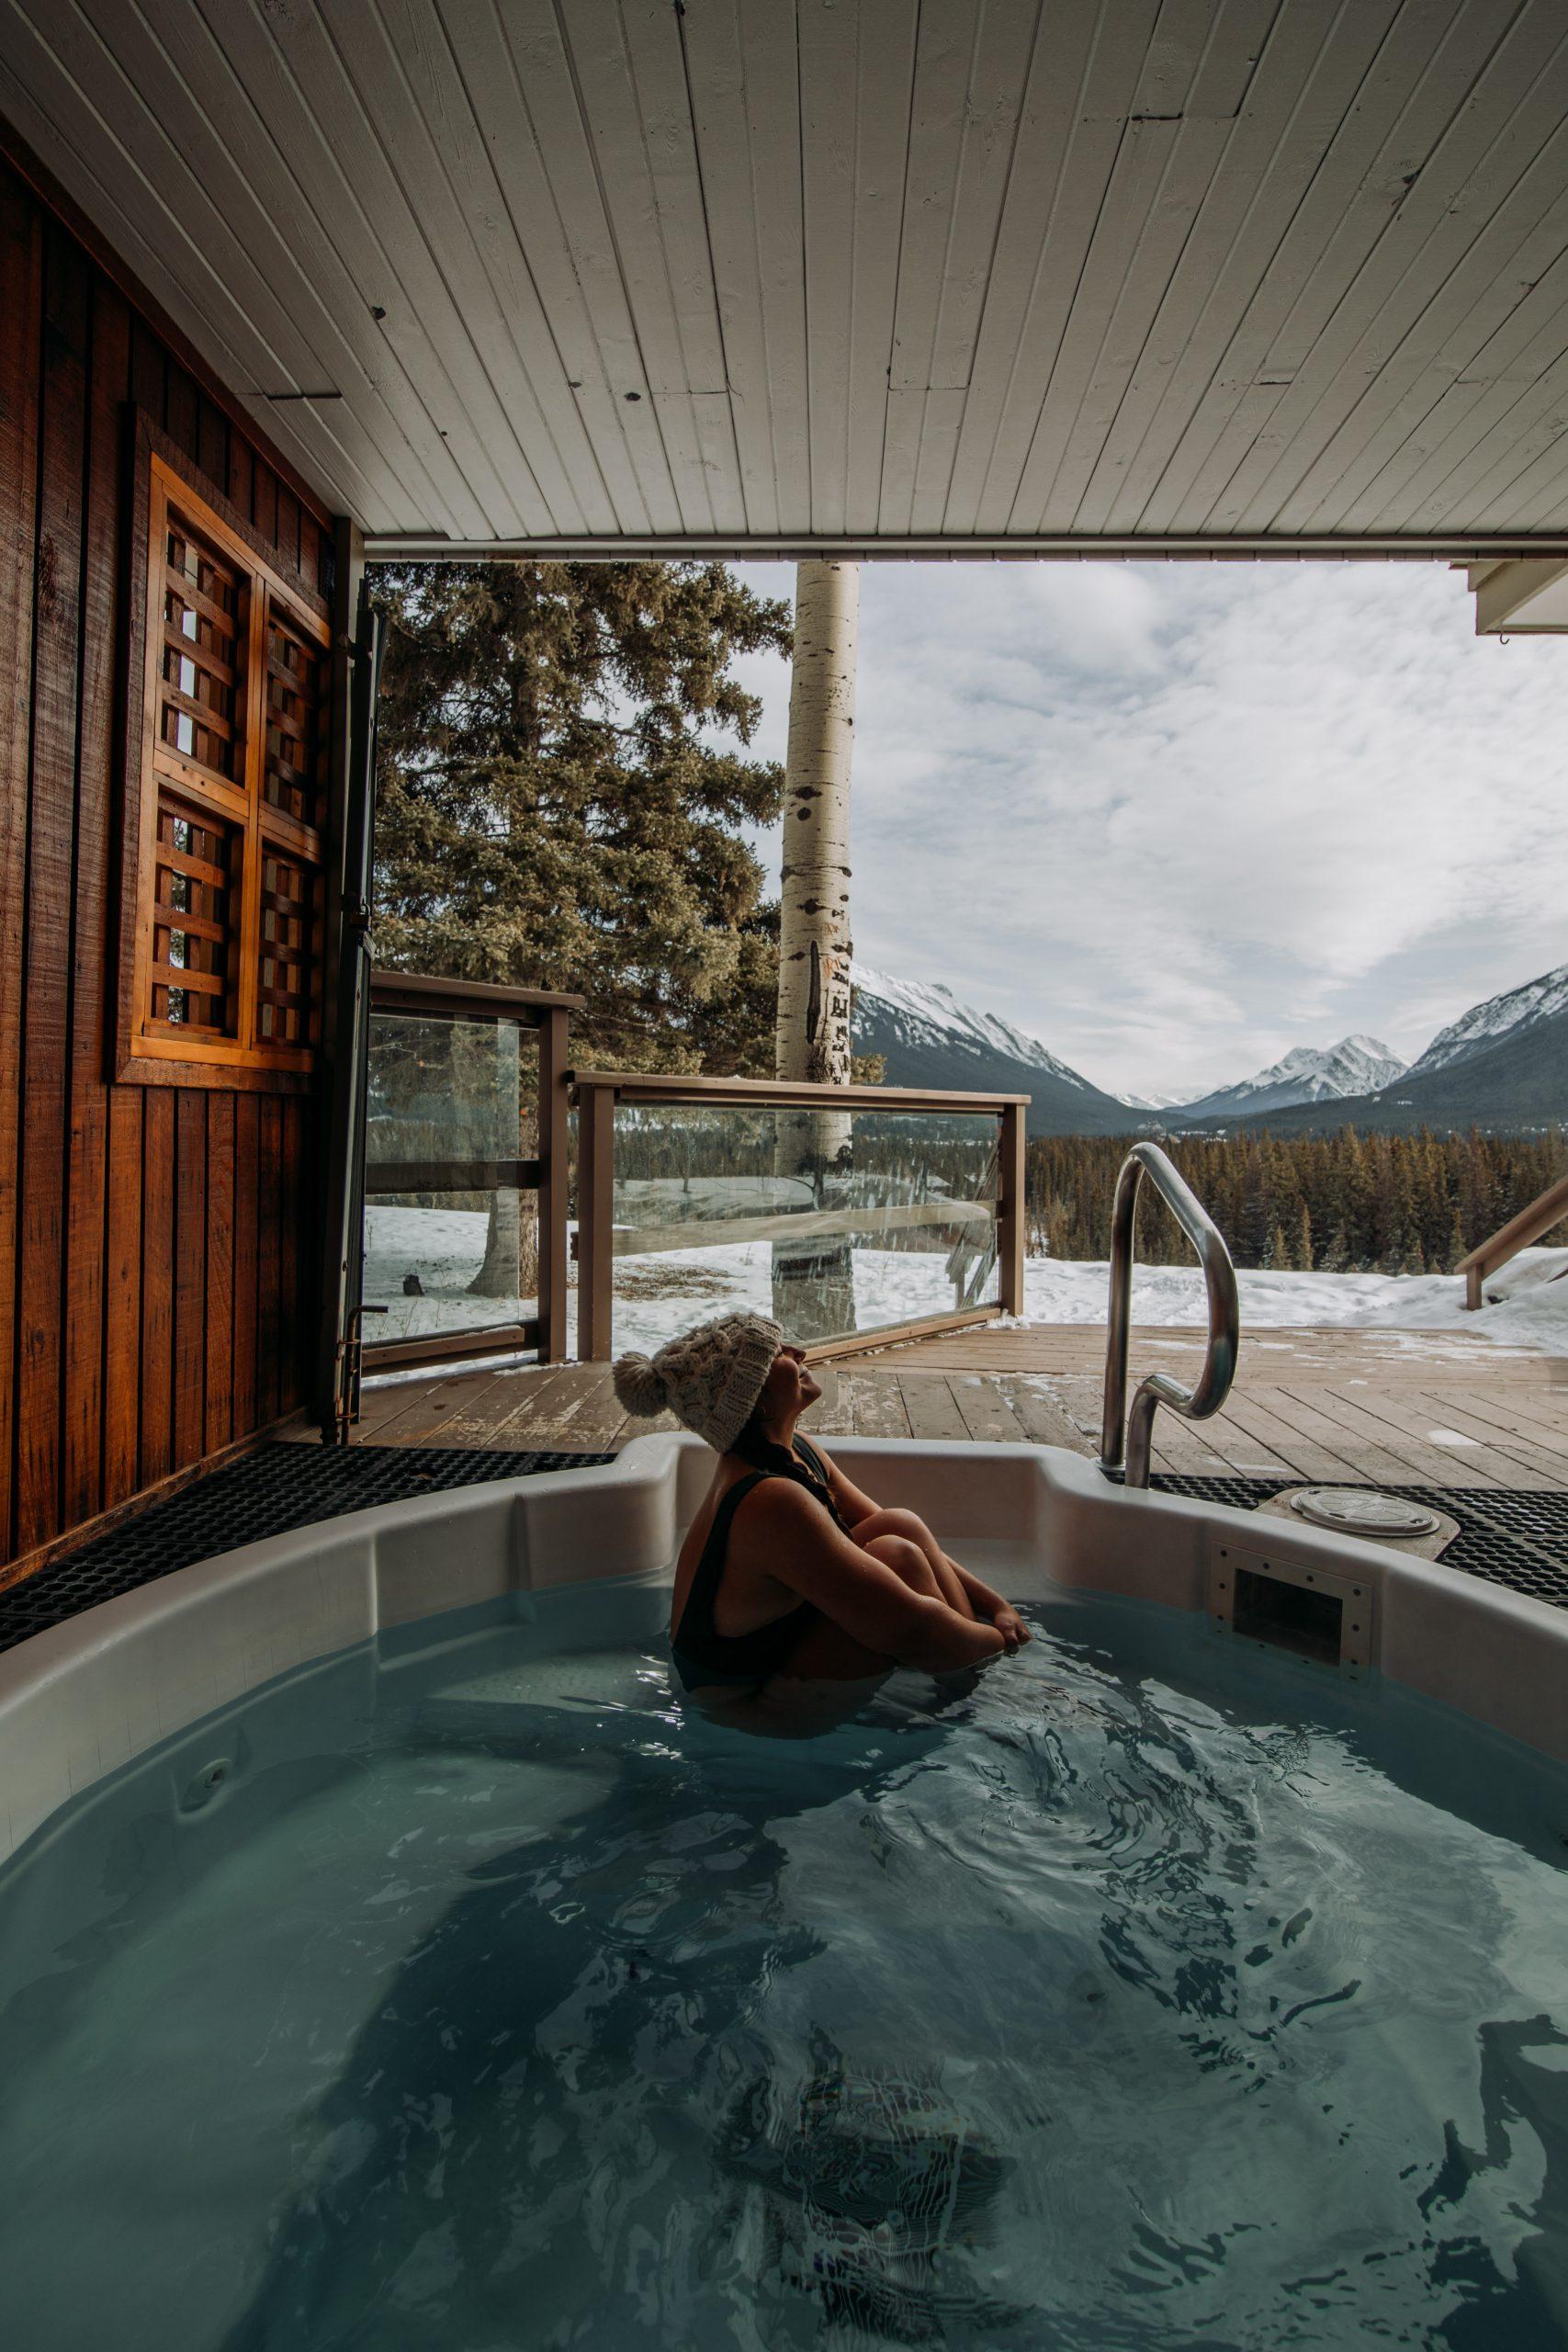 Girl in the hot tub in Banff, Canada